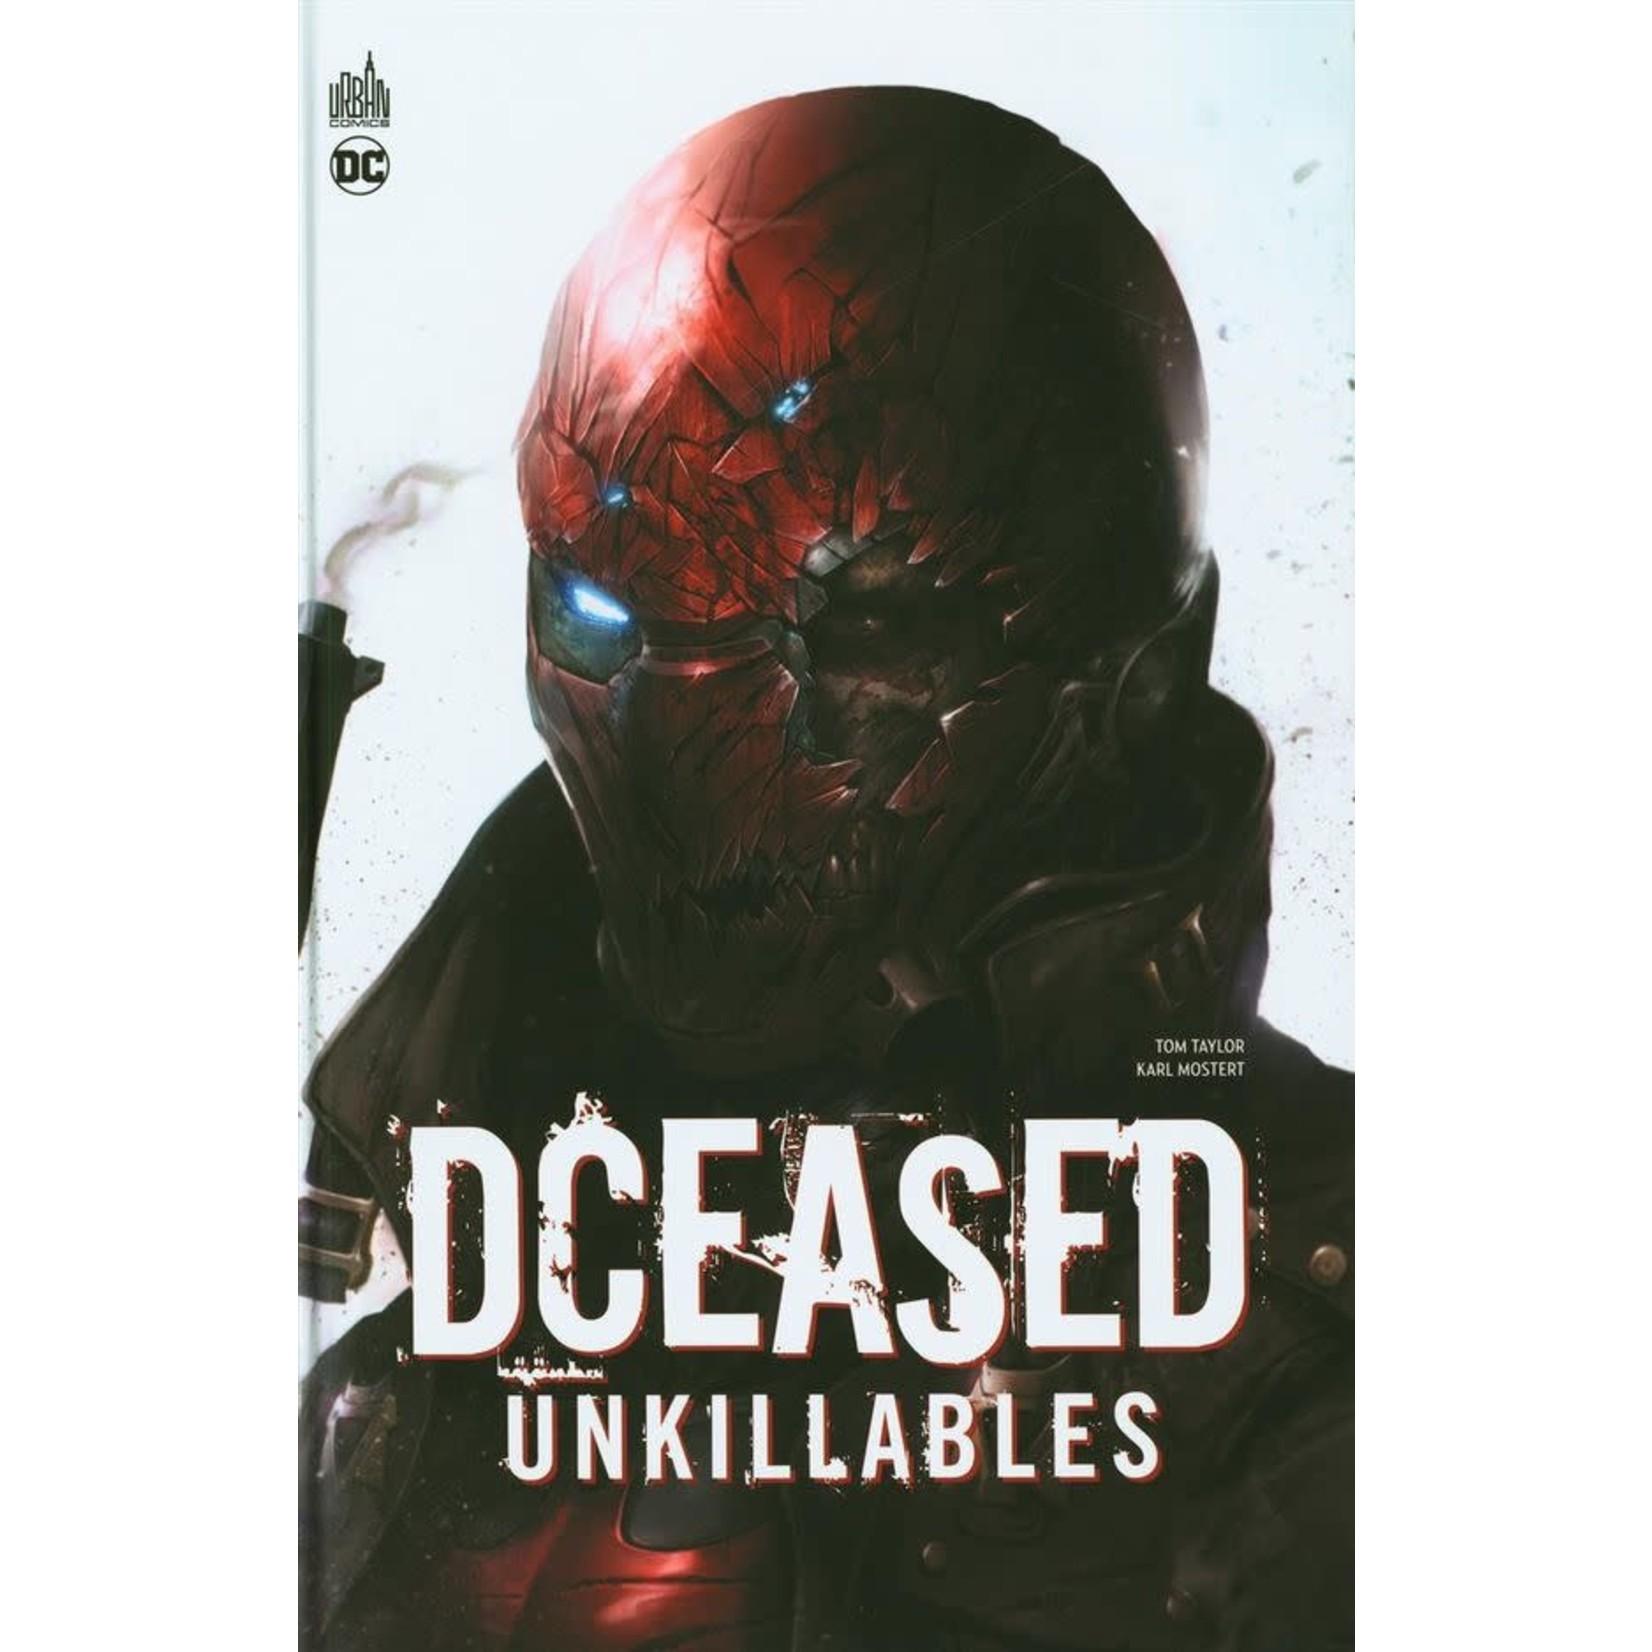 Urban Comics Dceased Unkillables